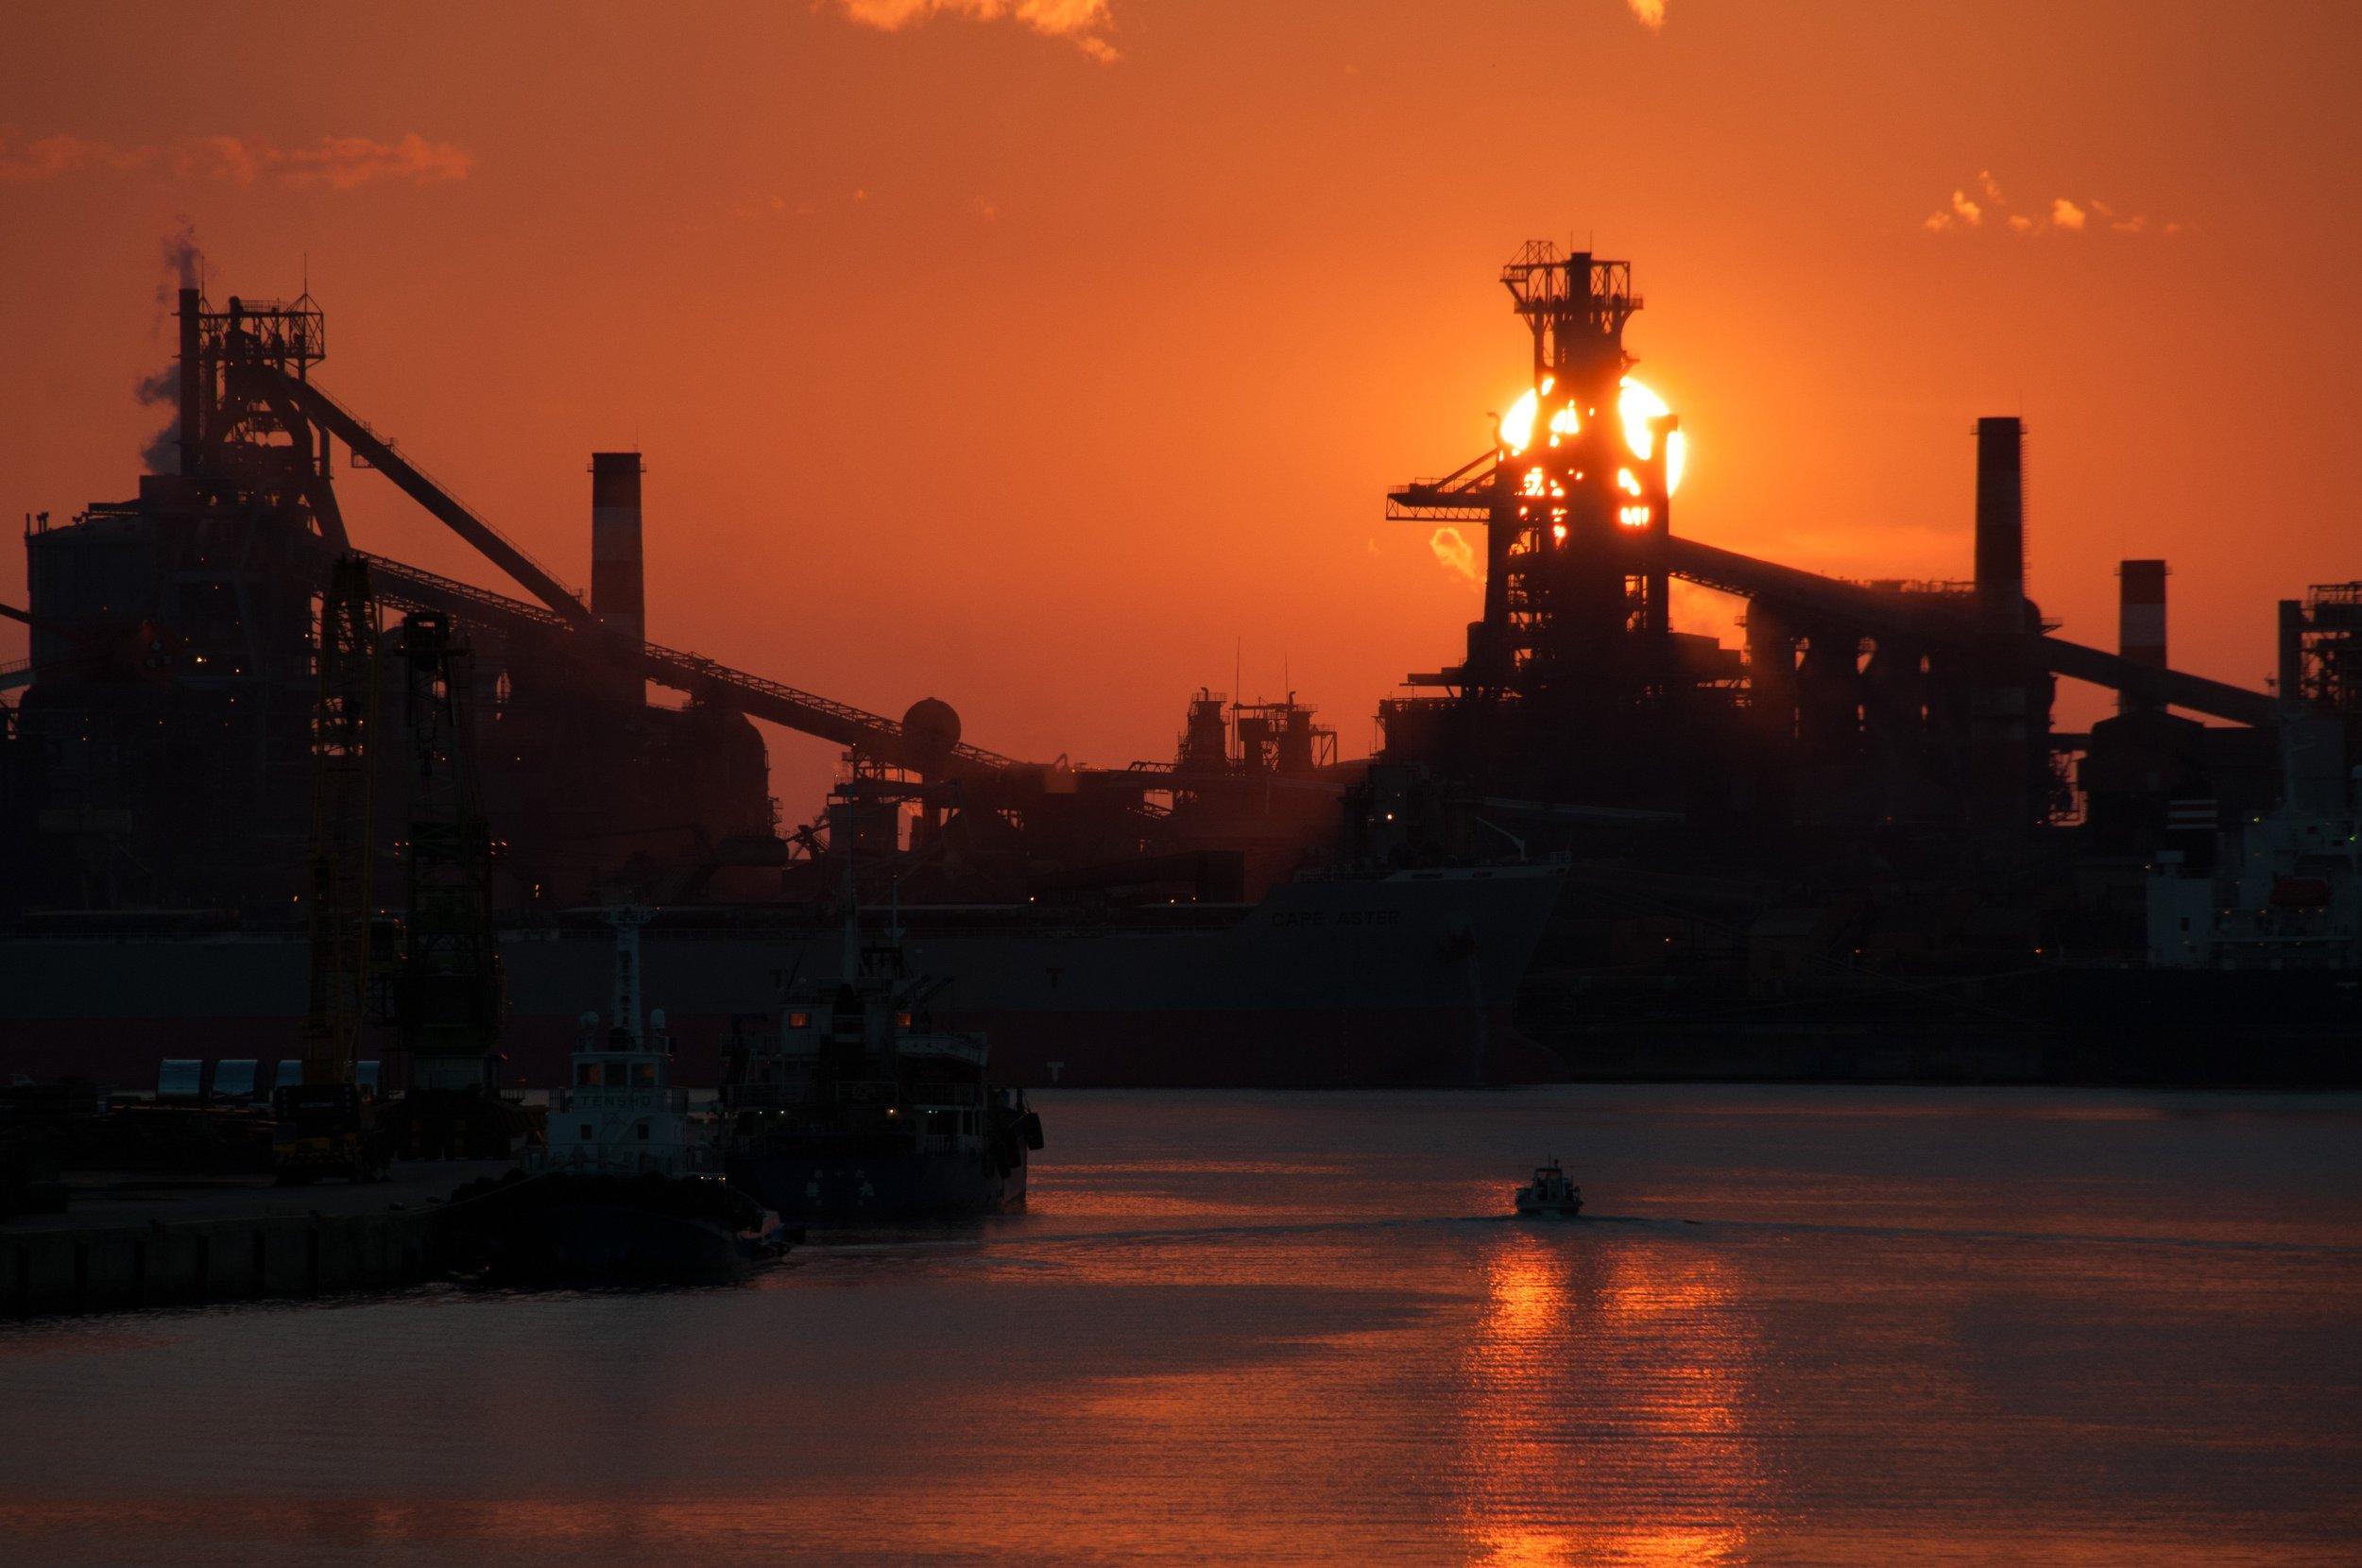 sunset-180544.jpg